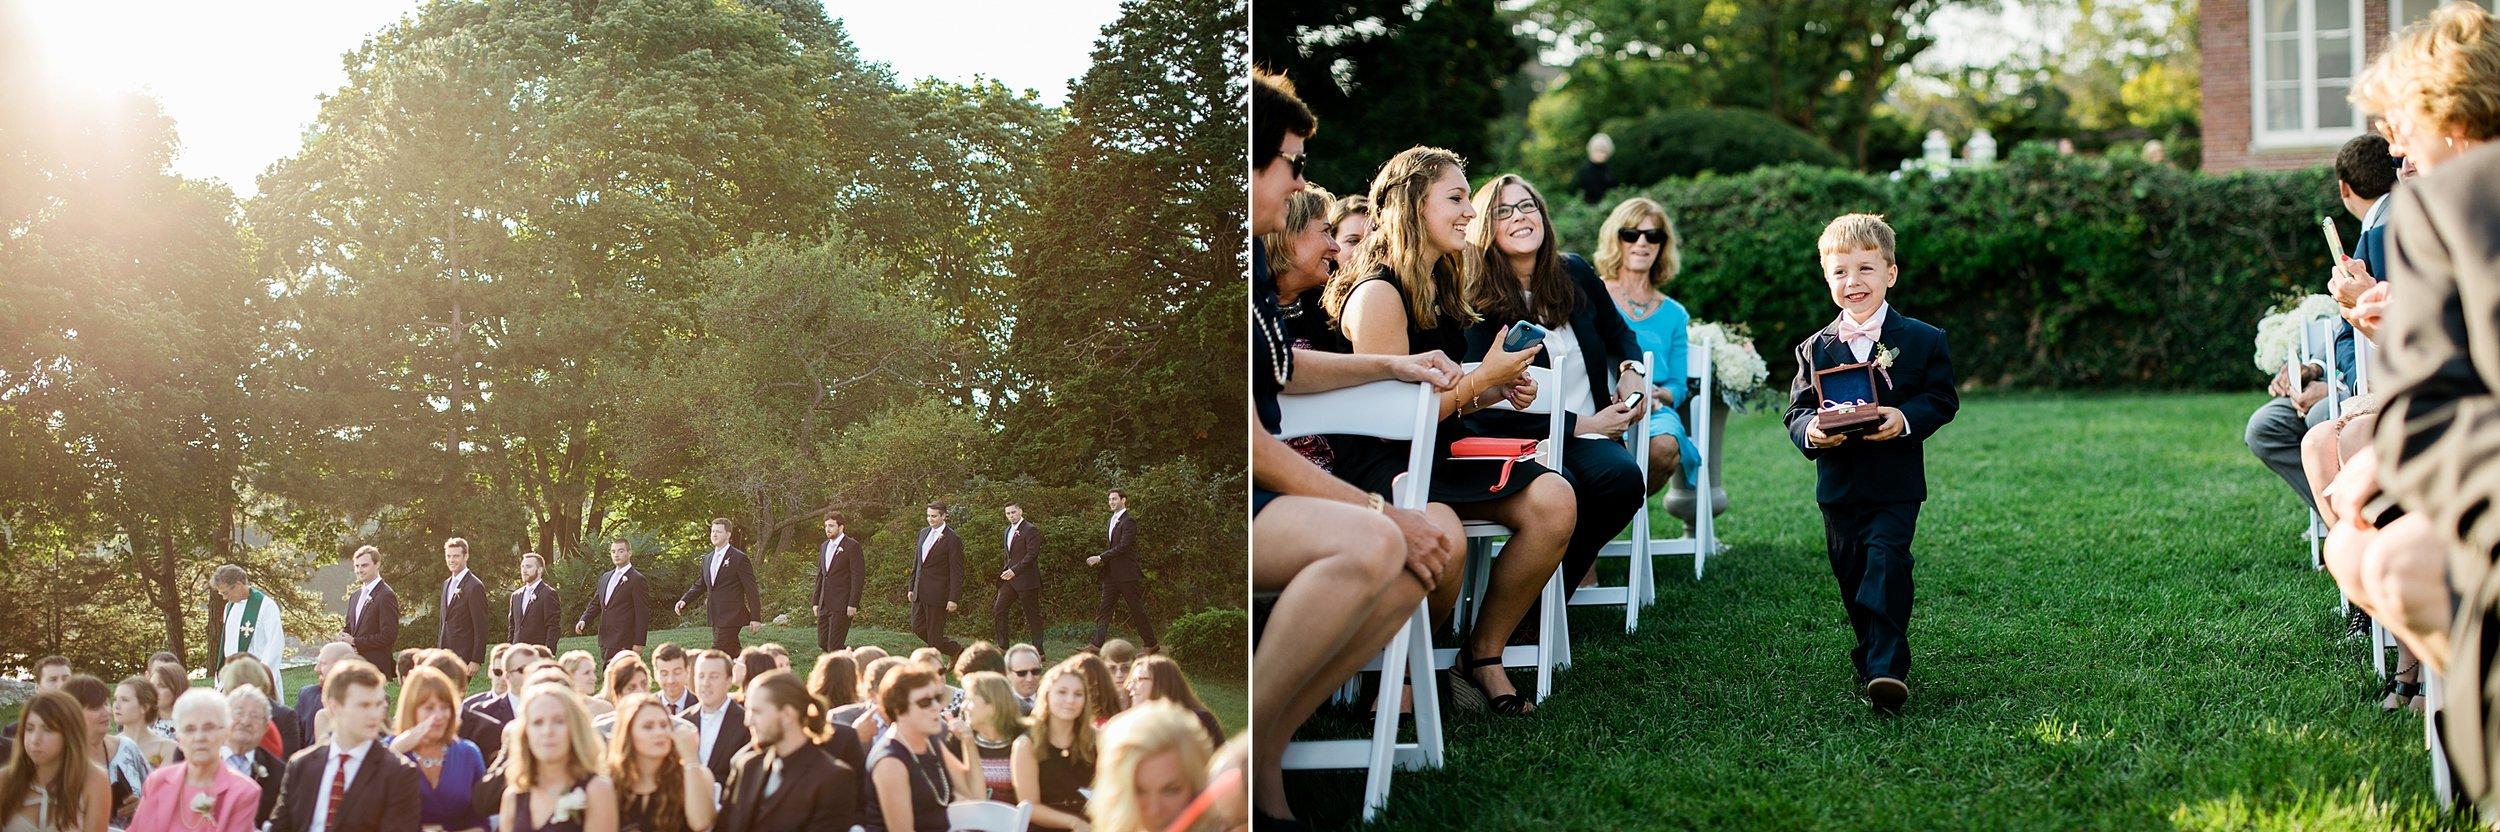 023 los angeles wedding photographer todd danforth photography boston.jpg